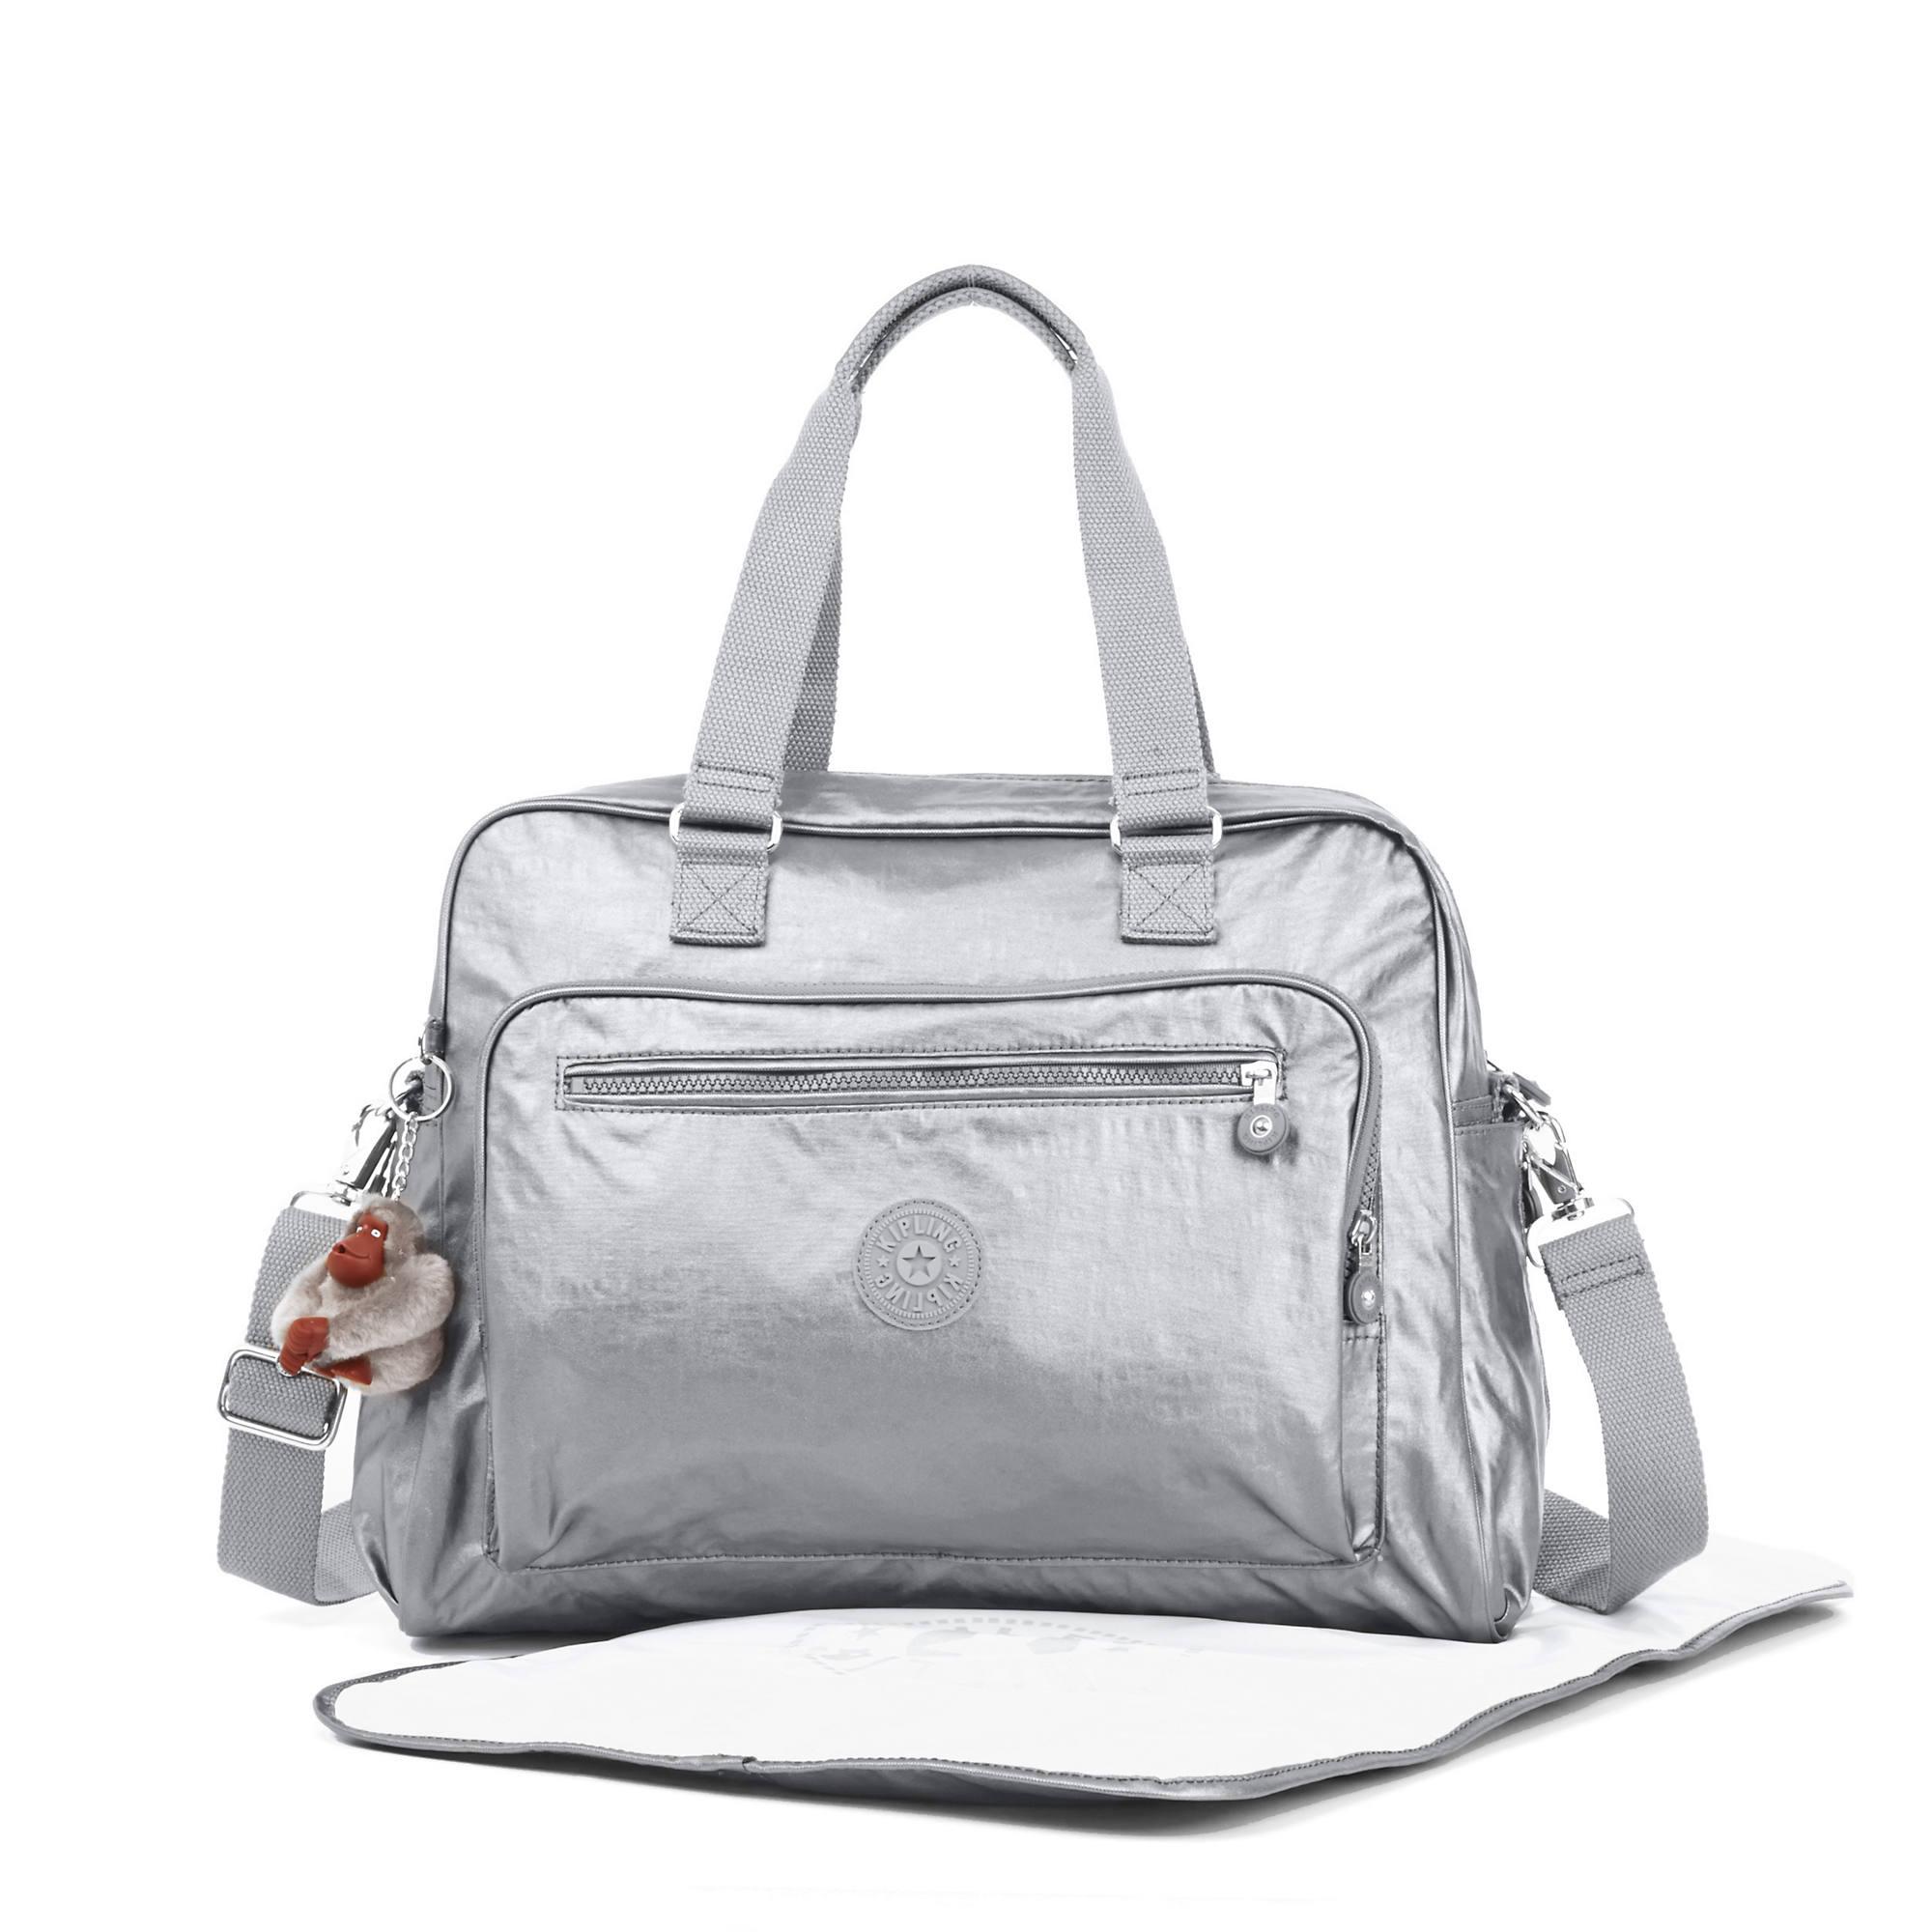 diaper baby bags designer a9fu  Alanna Metallic Diaper Bag